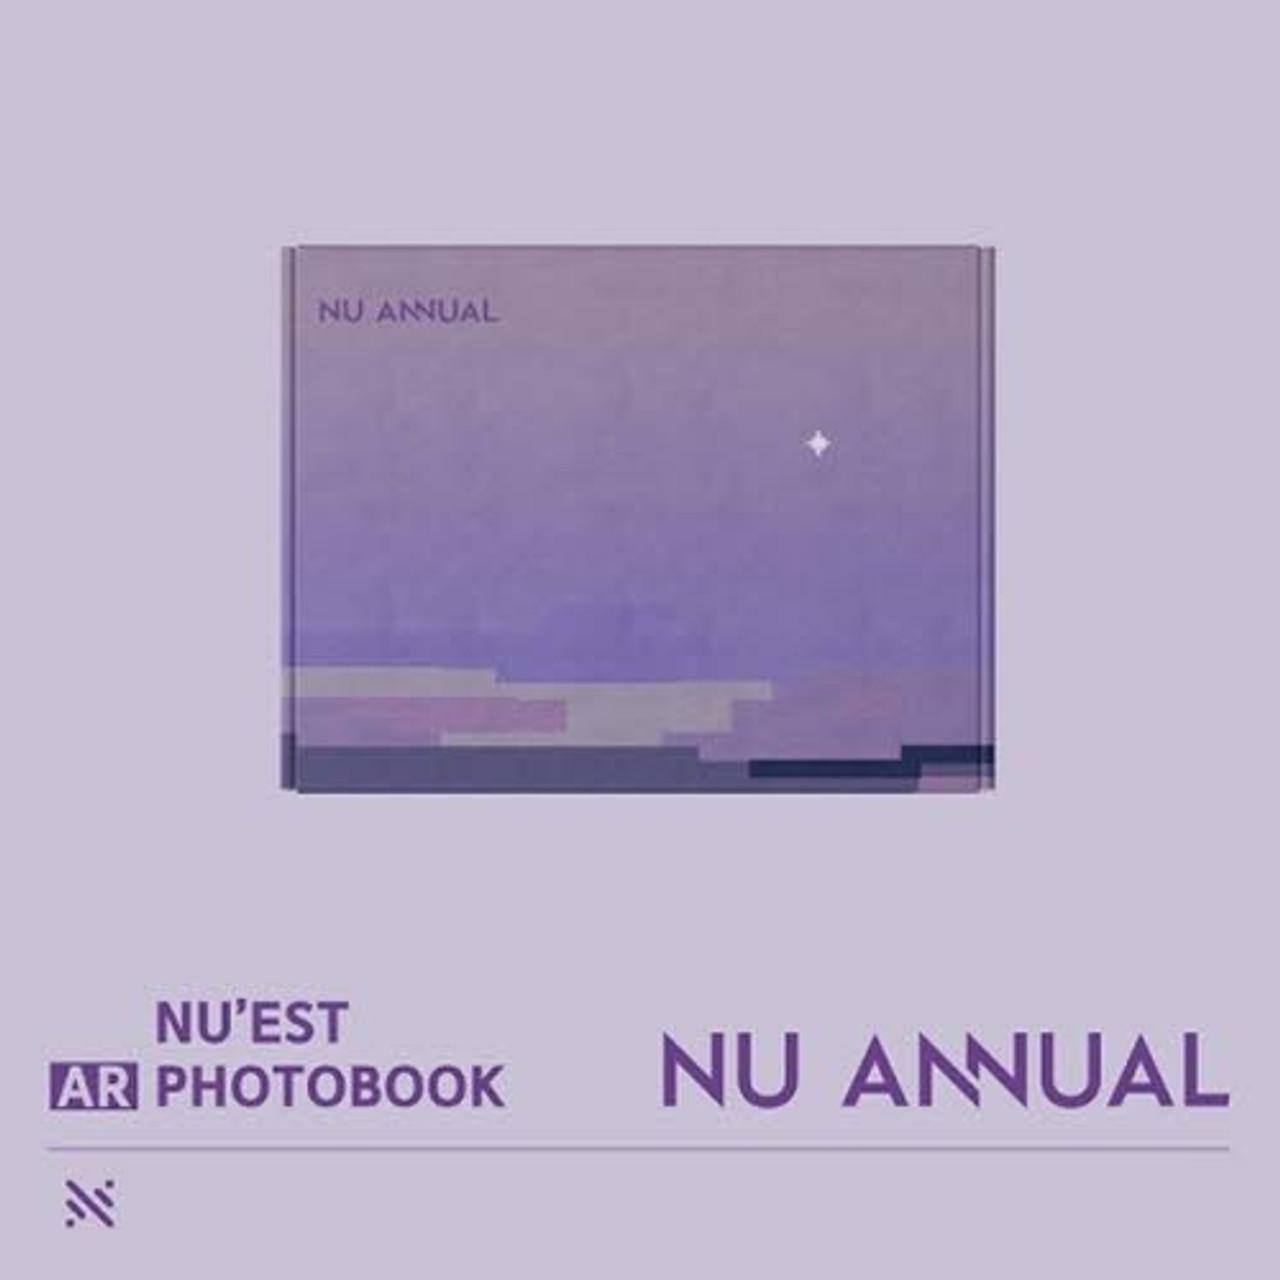 NUEST - NU ANNUAL (AR Photobook) + Poster